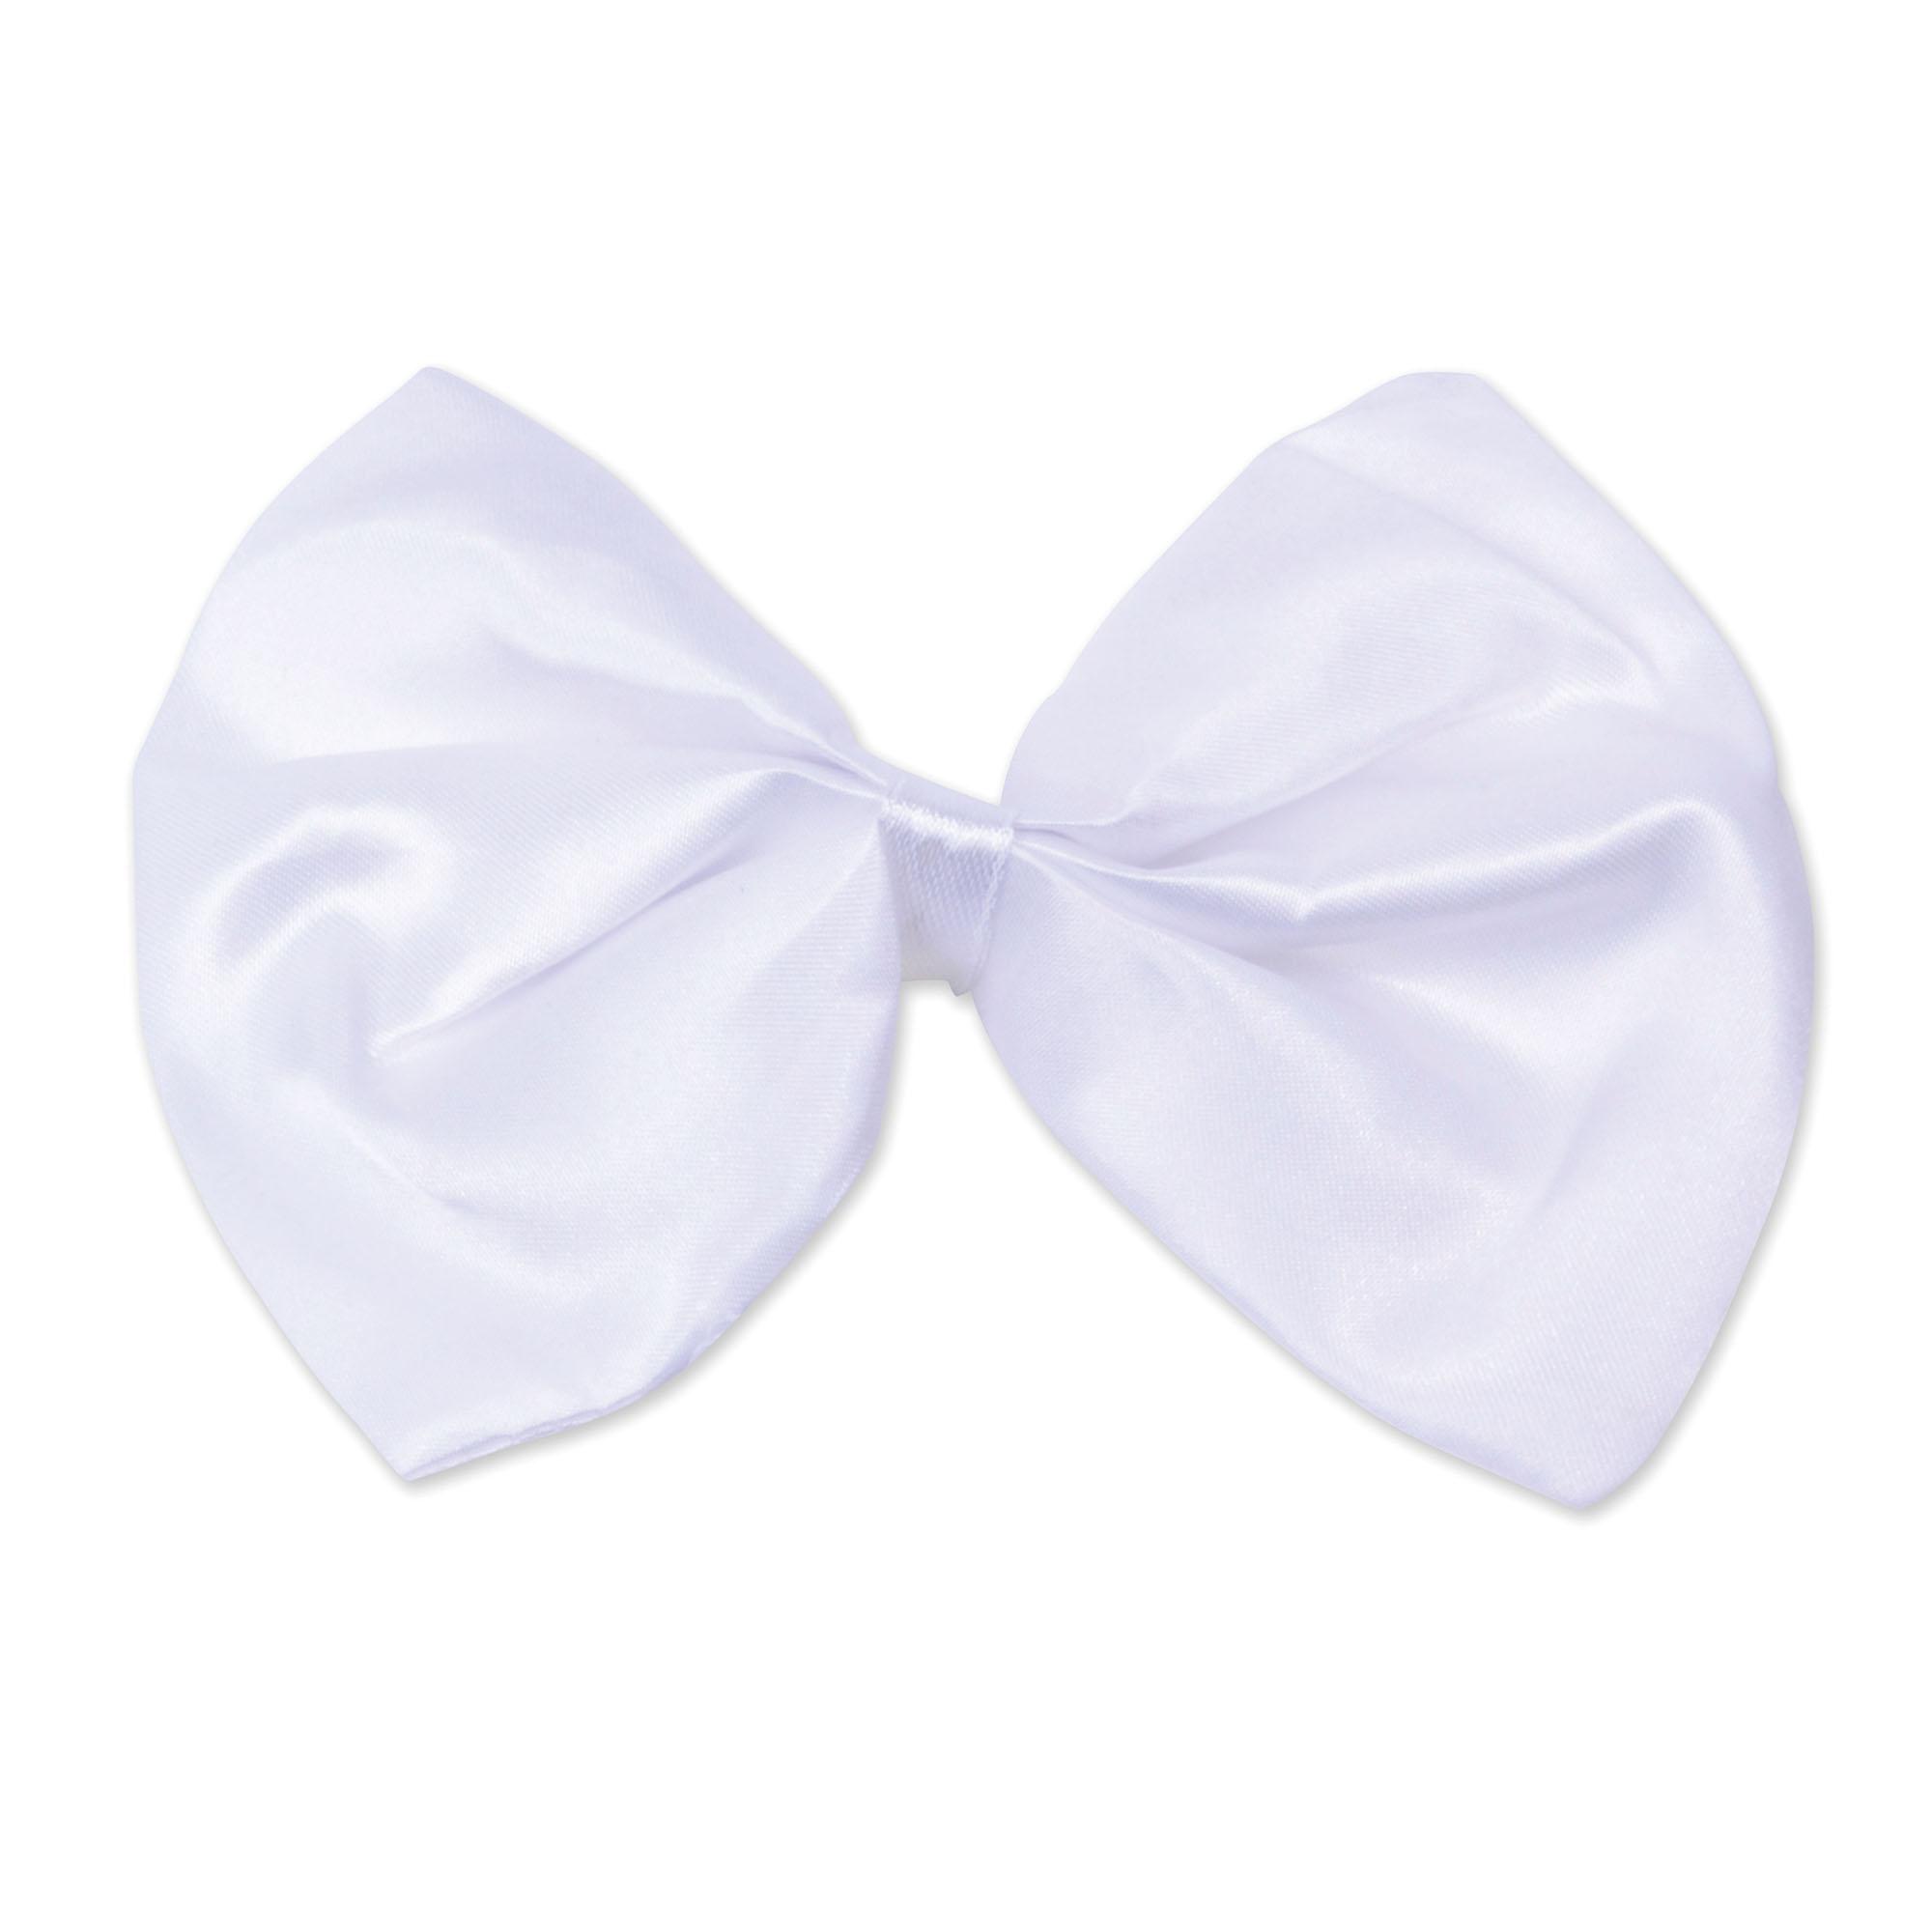 ACCESSORIES/TIES & BRACES/Best Bow Tie